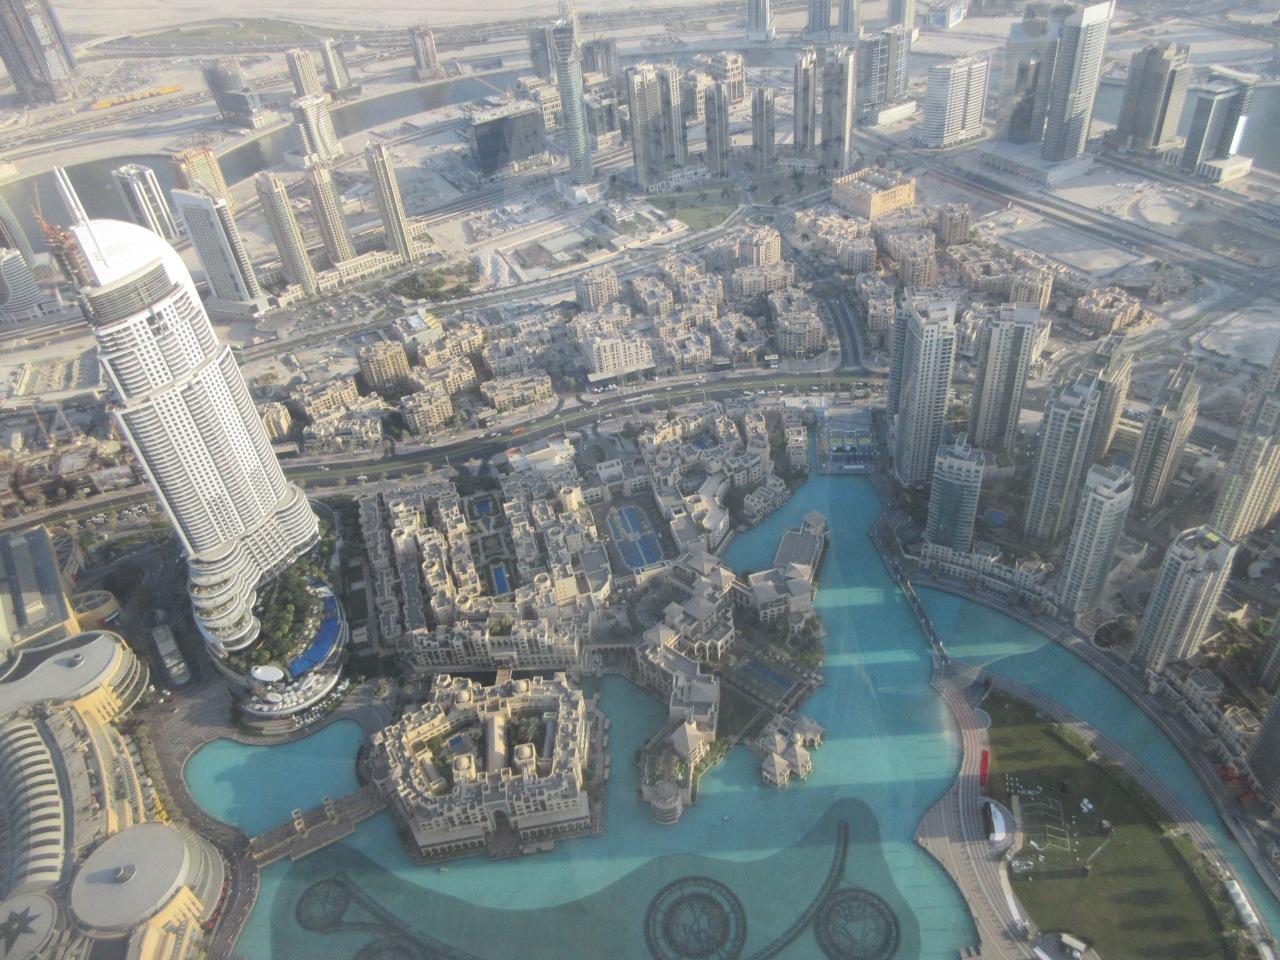 Selfie central at Dubai's BurjKhalifa